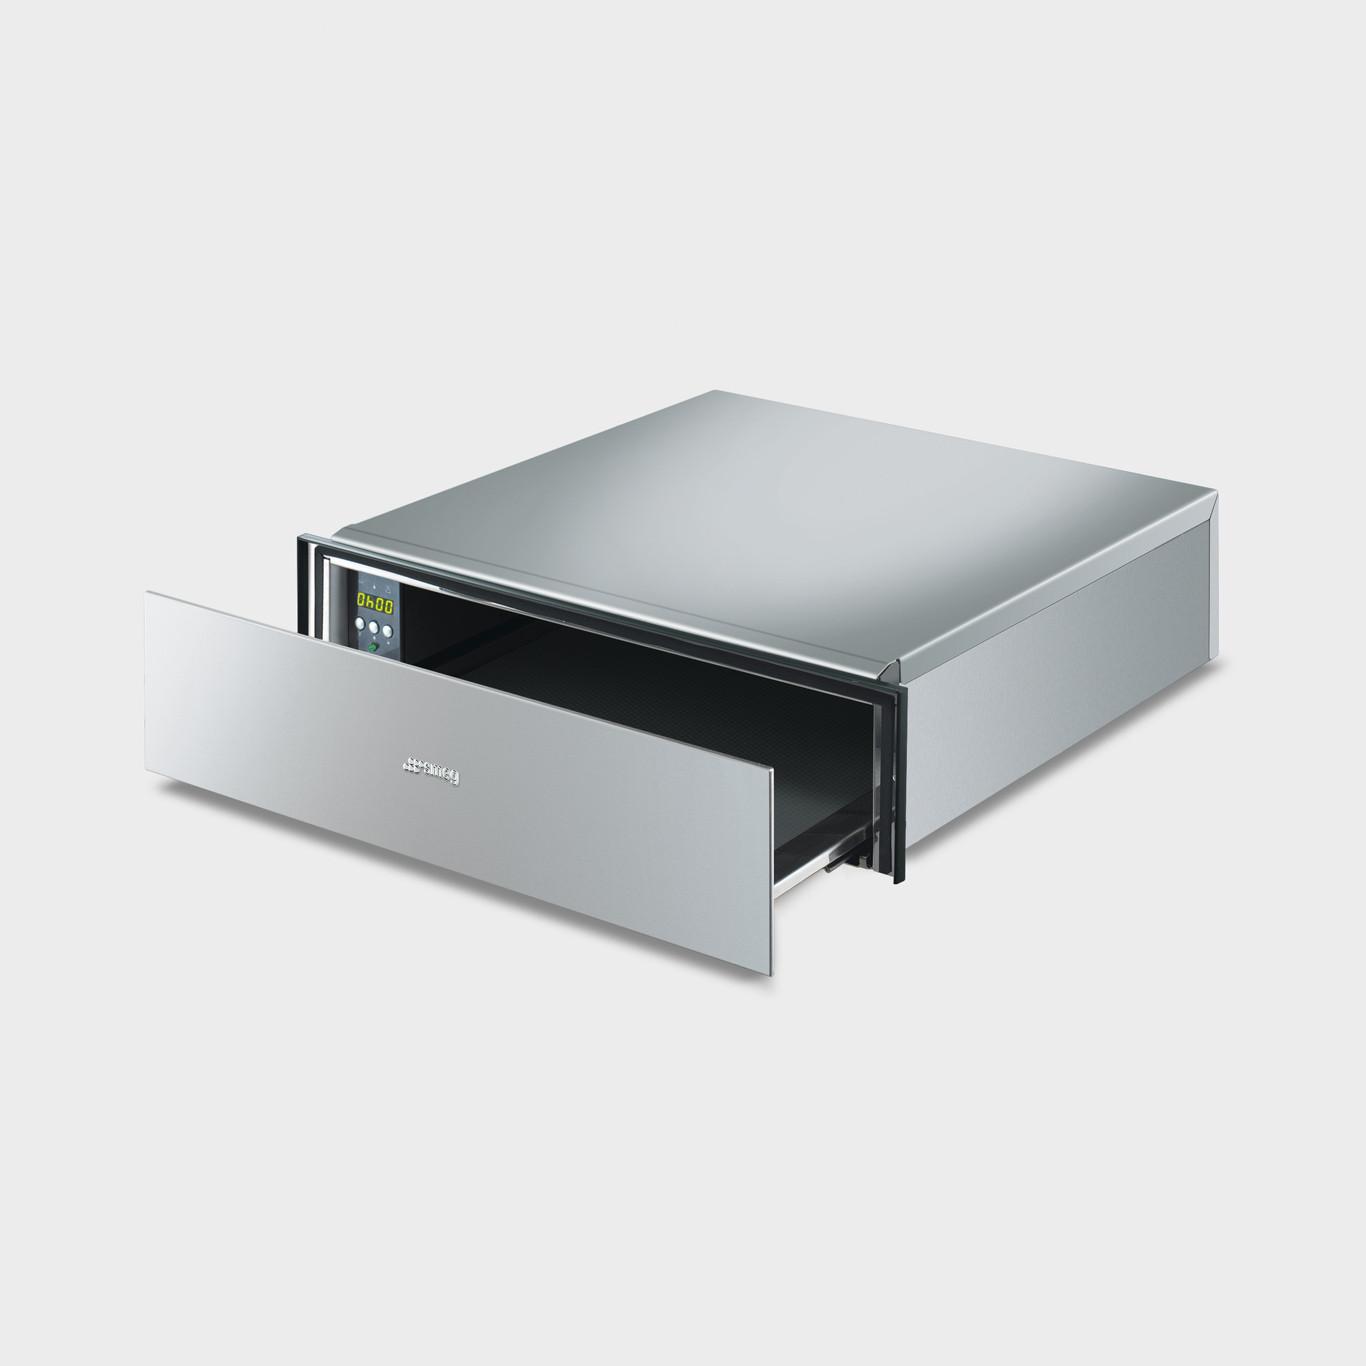 Smeg CTP15X Cucina 15cm Stainless Steel Warming Drawer